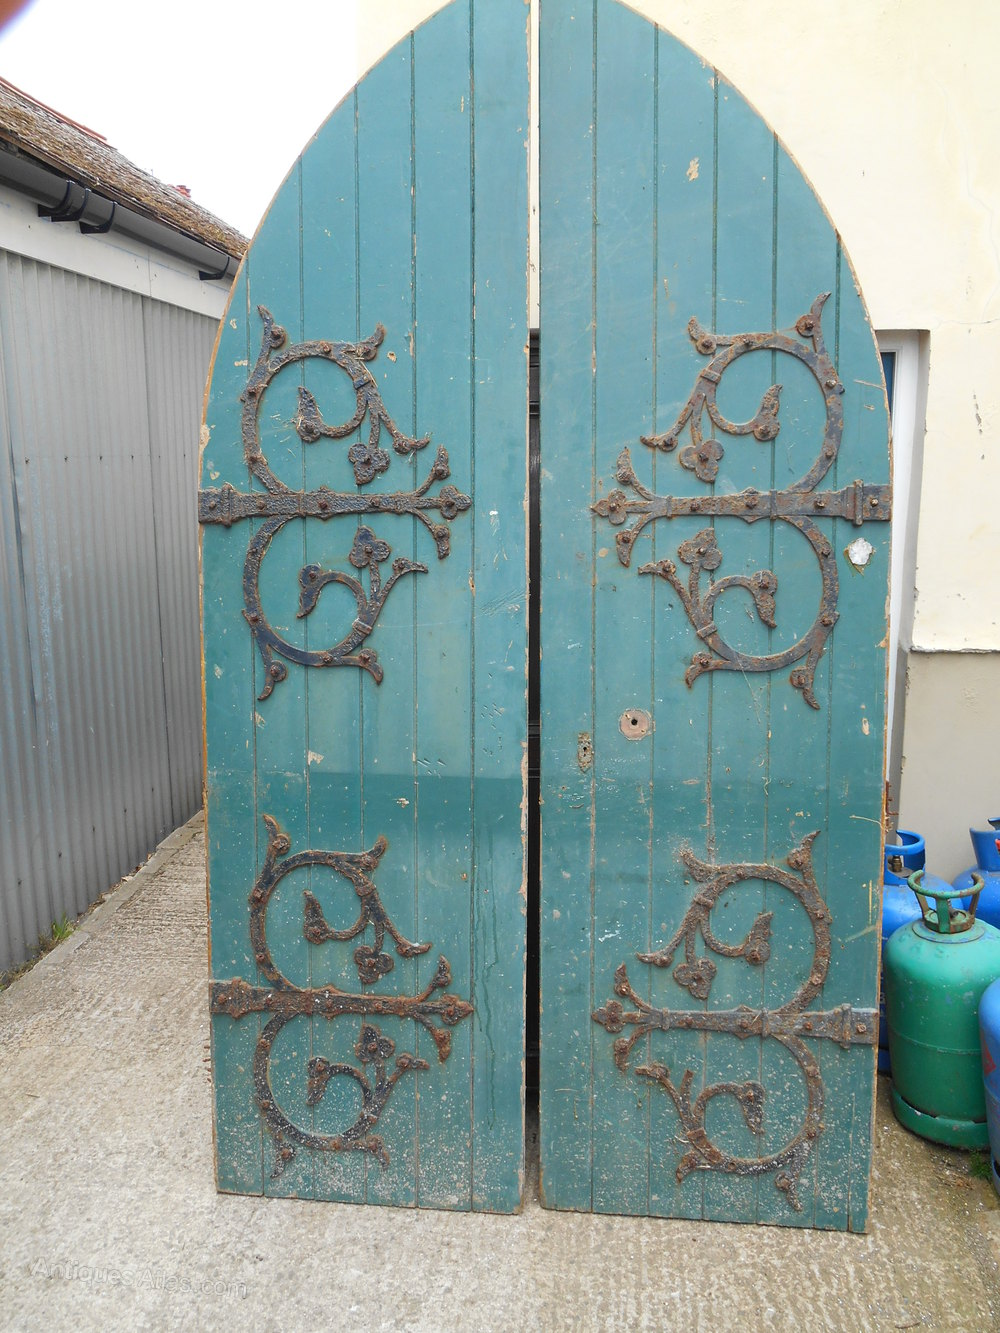 Antiques Atlas Antique Victorian Church Doors - Antique Church Doors - Best  2000+ Antique Decor - Antique Church Doors Antique Furniture